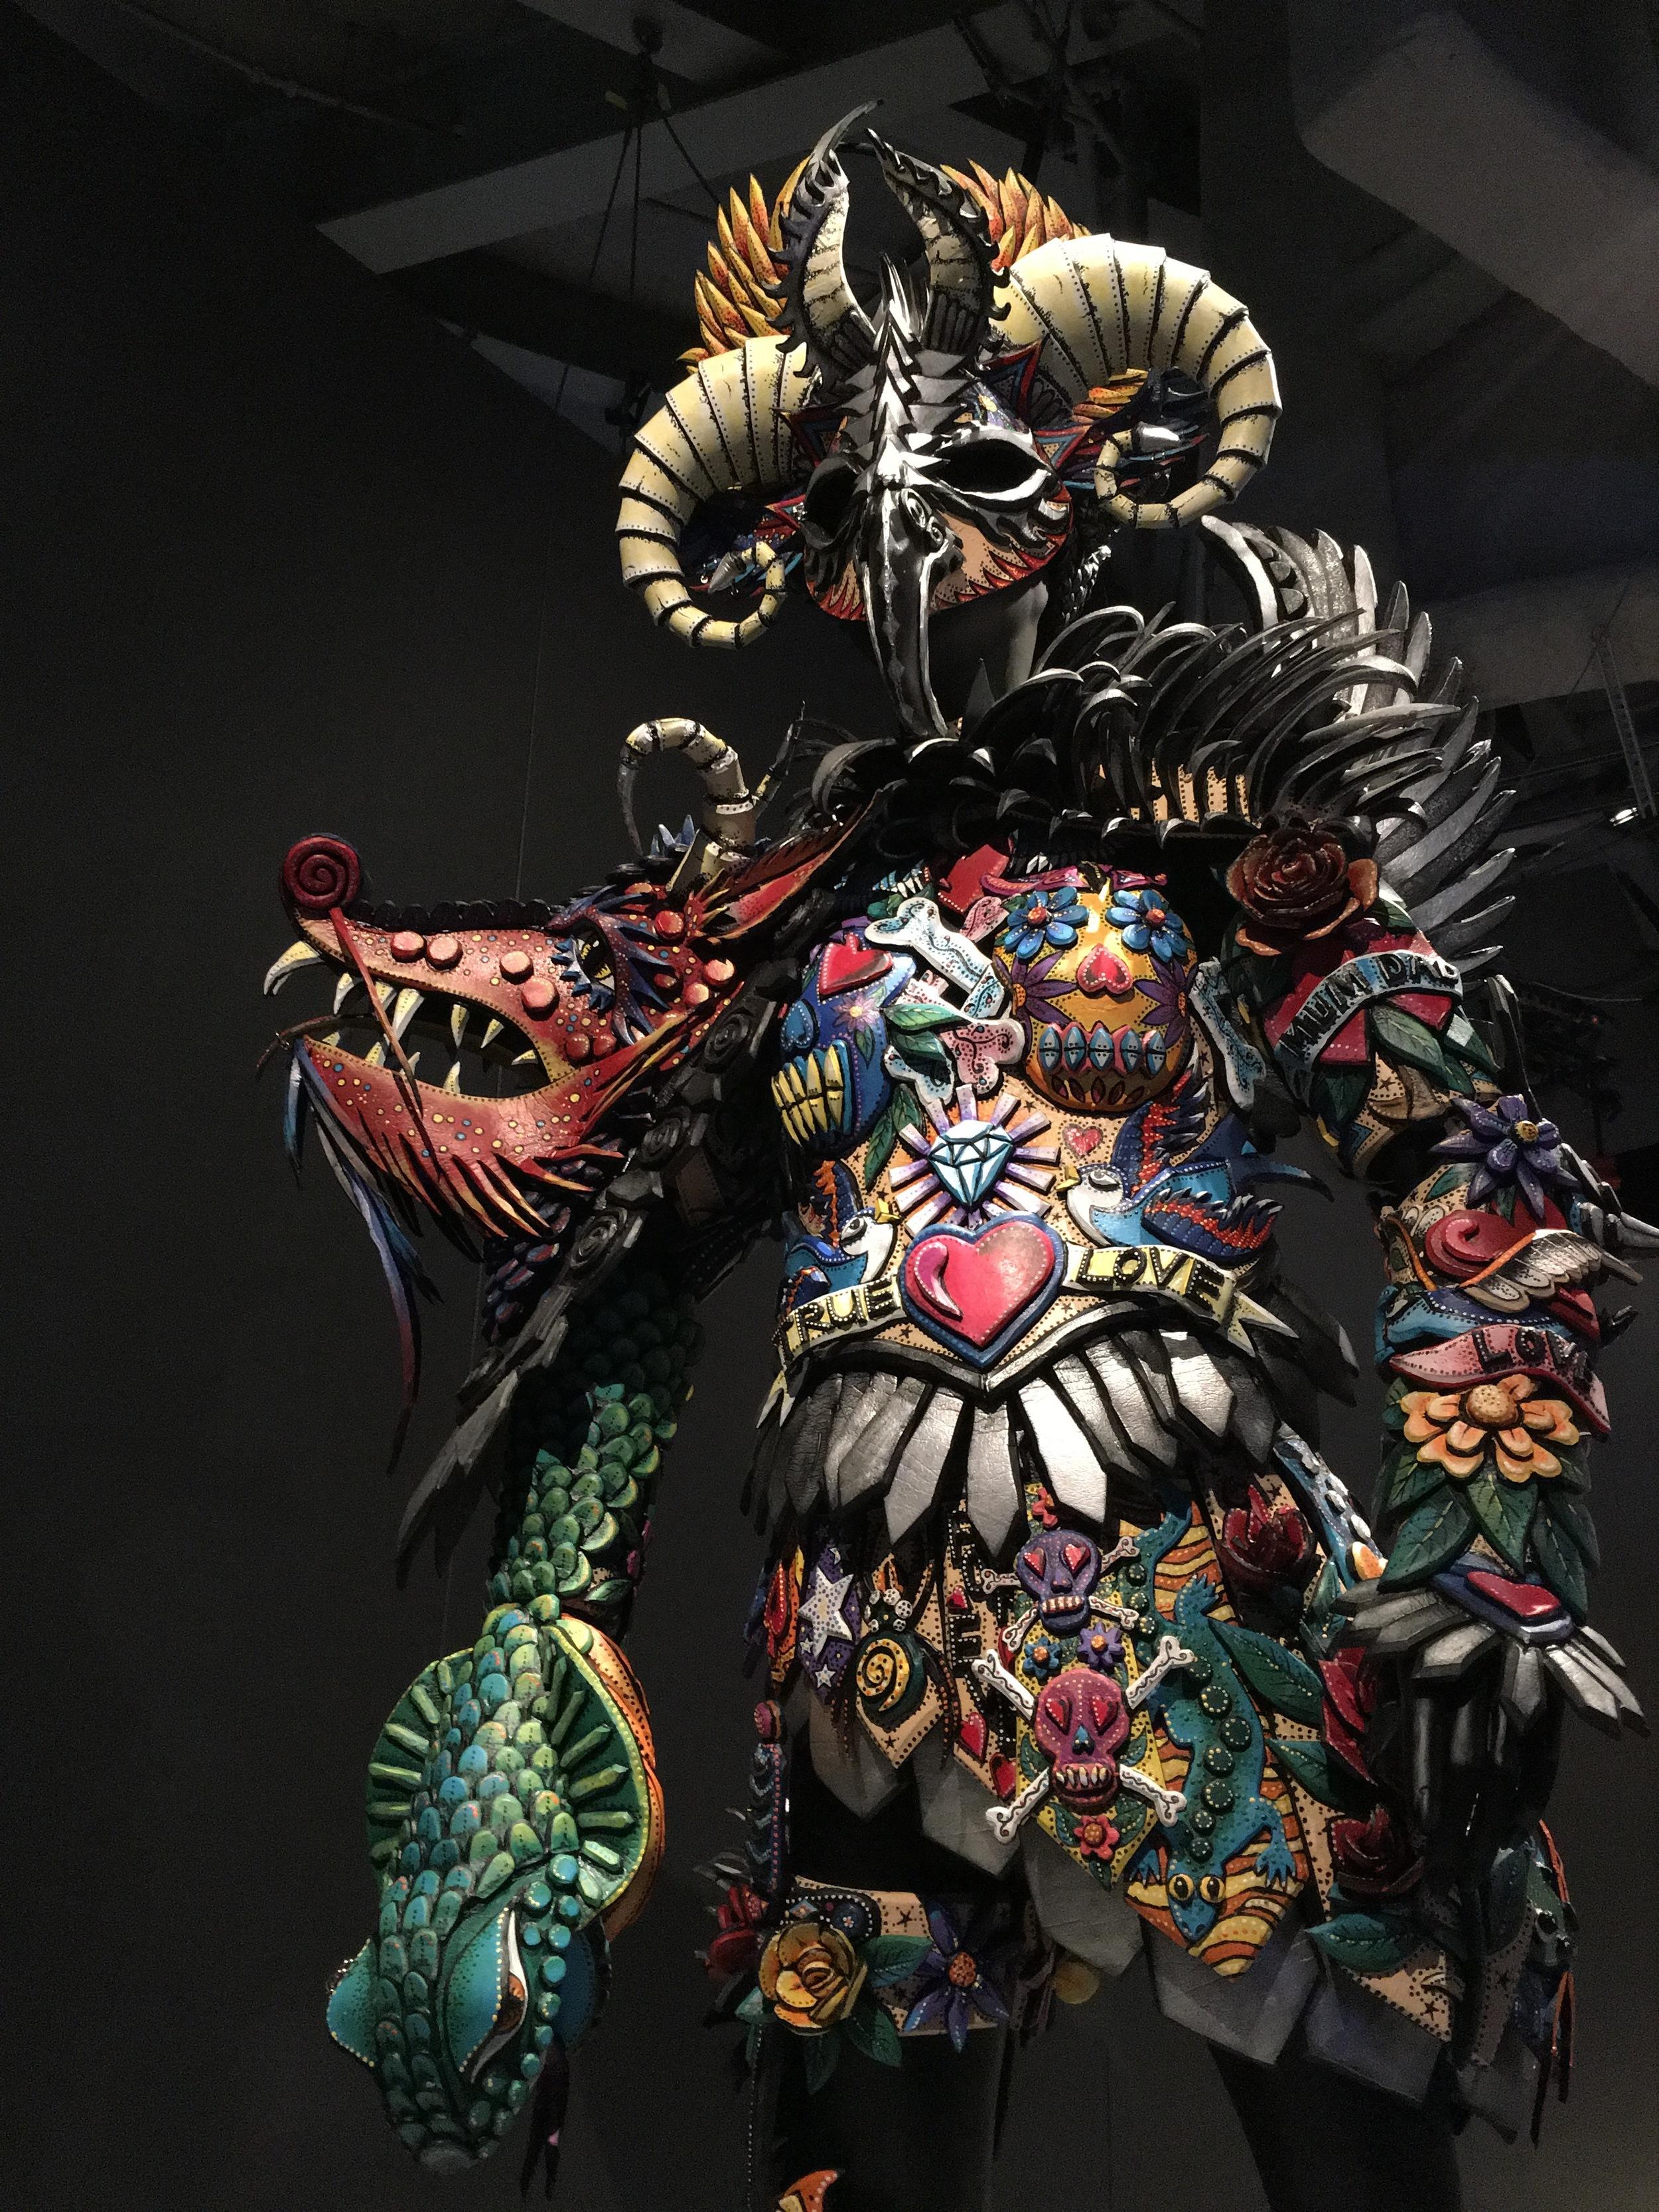 World of Wearable Art - EMP Museum 2.JPG